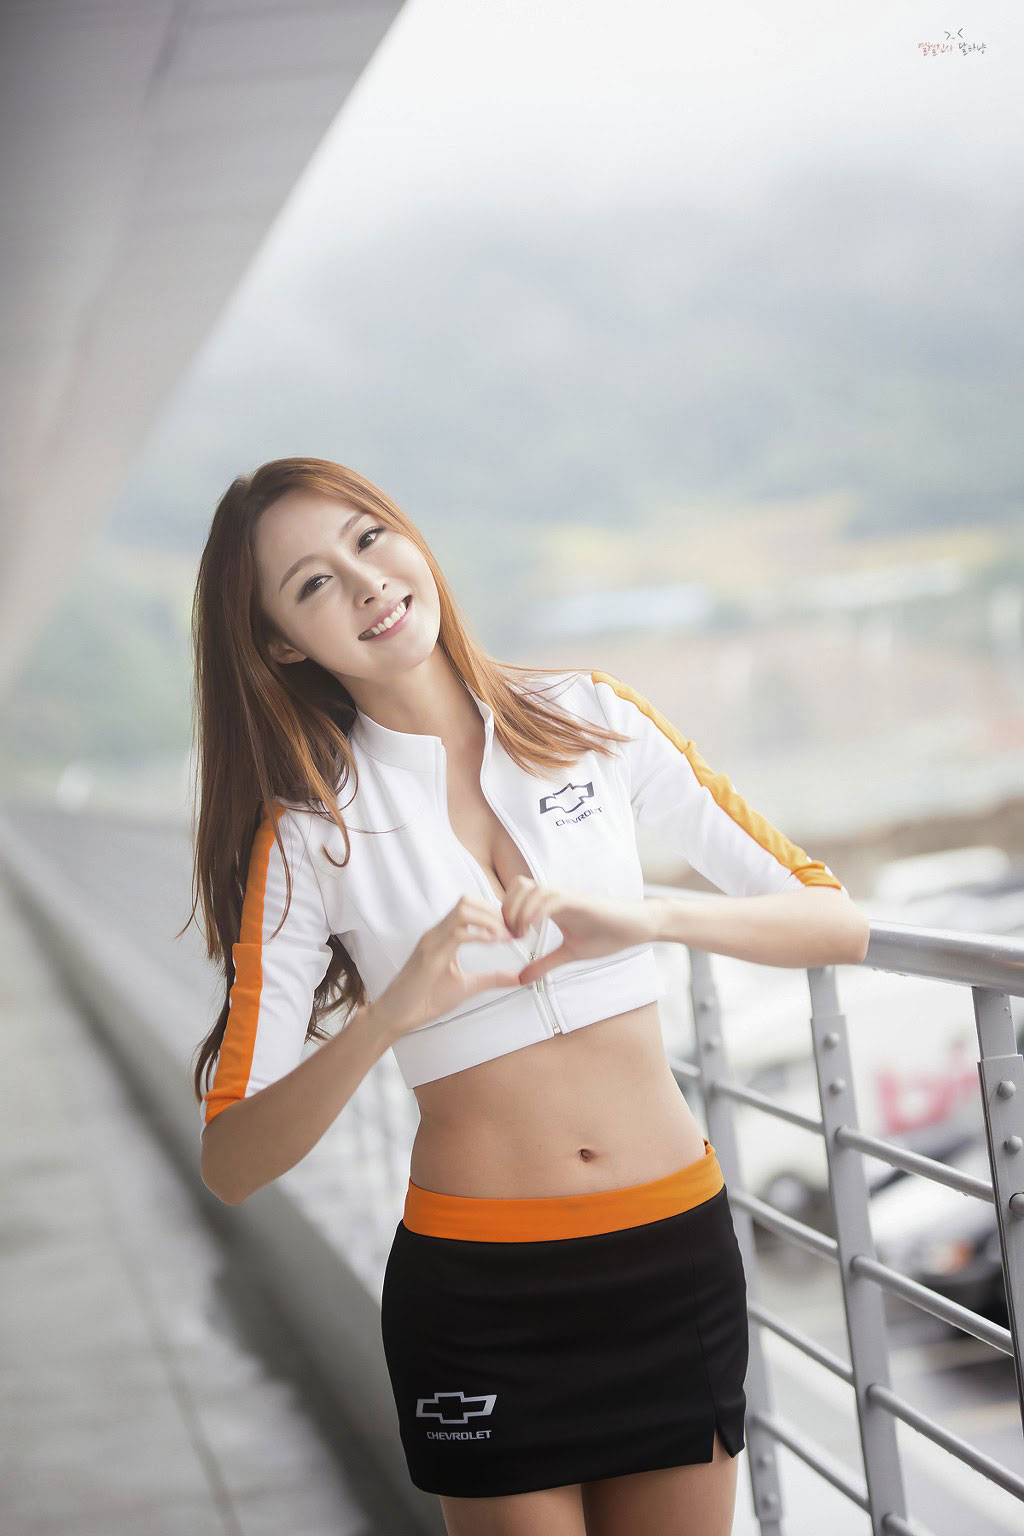 Eun Bin CJ Super Race 2013